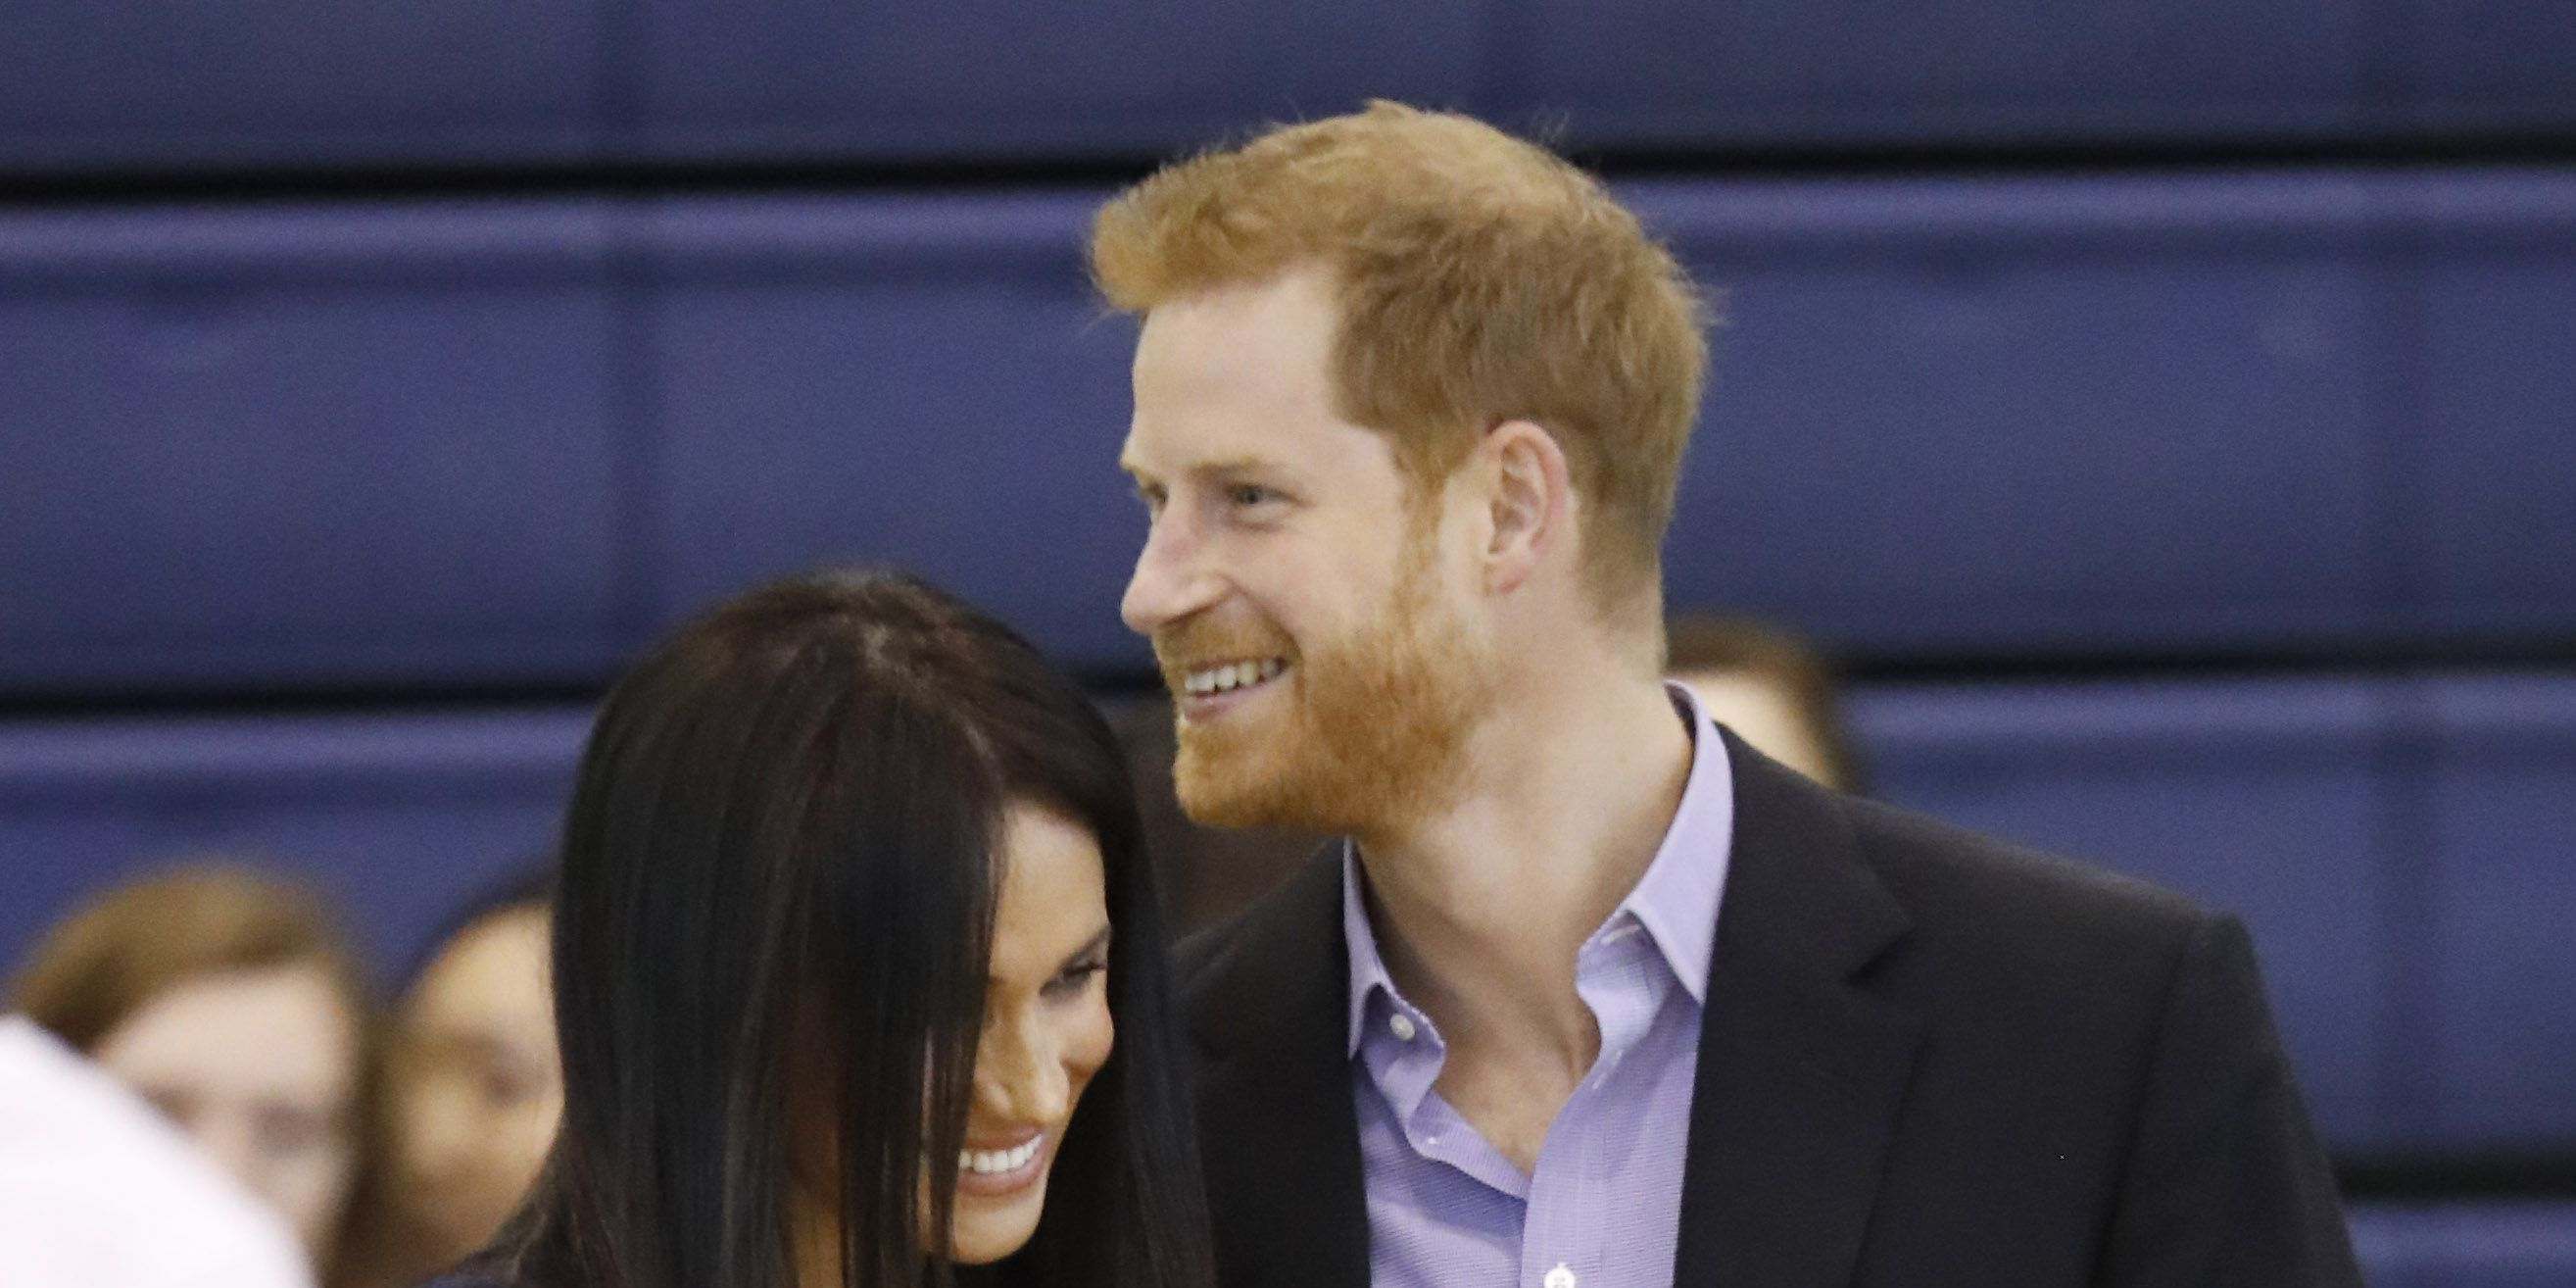 Prince Harry and Meghan Markle atat Loughborough University